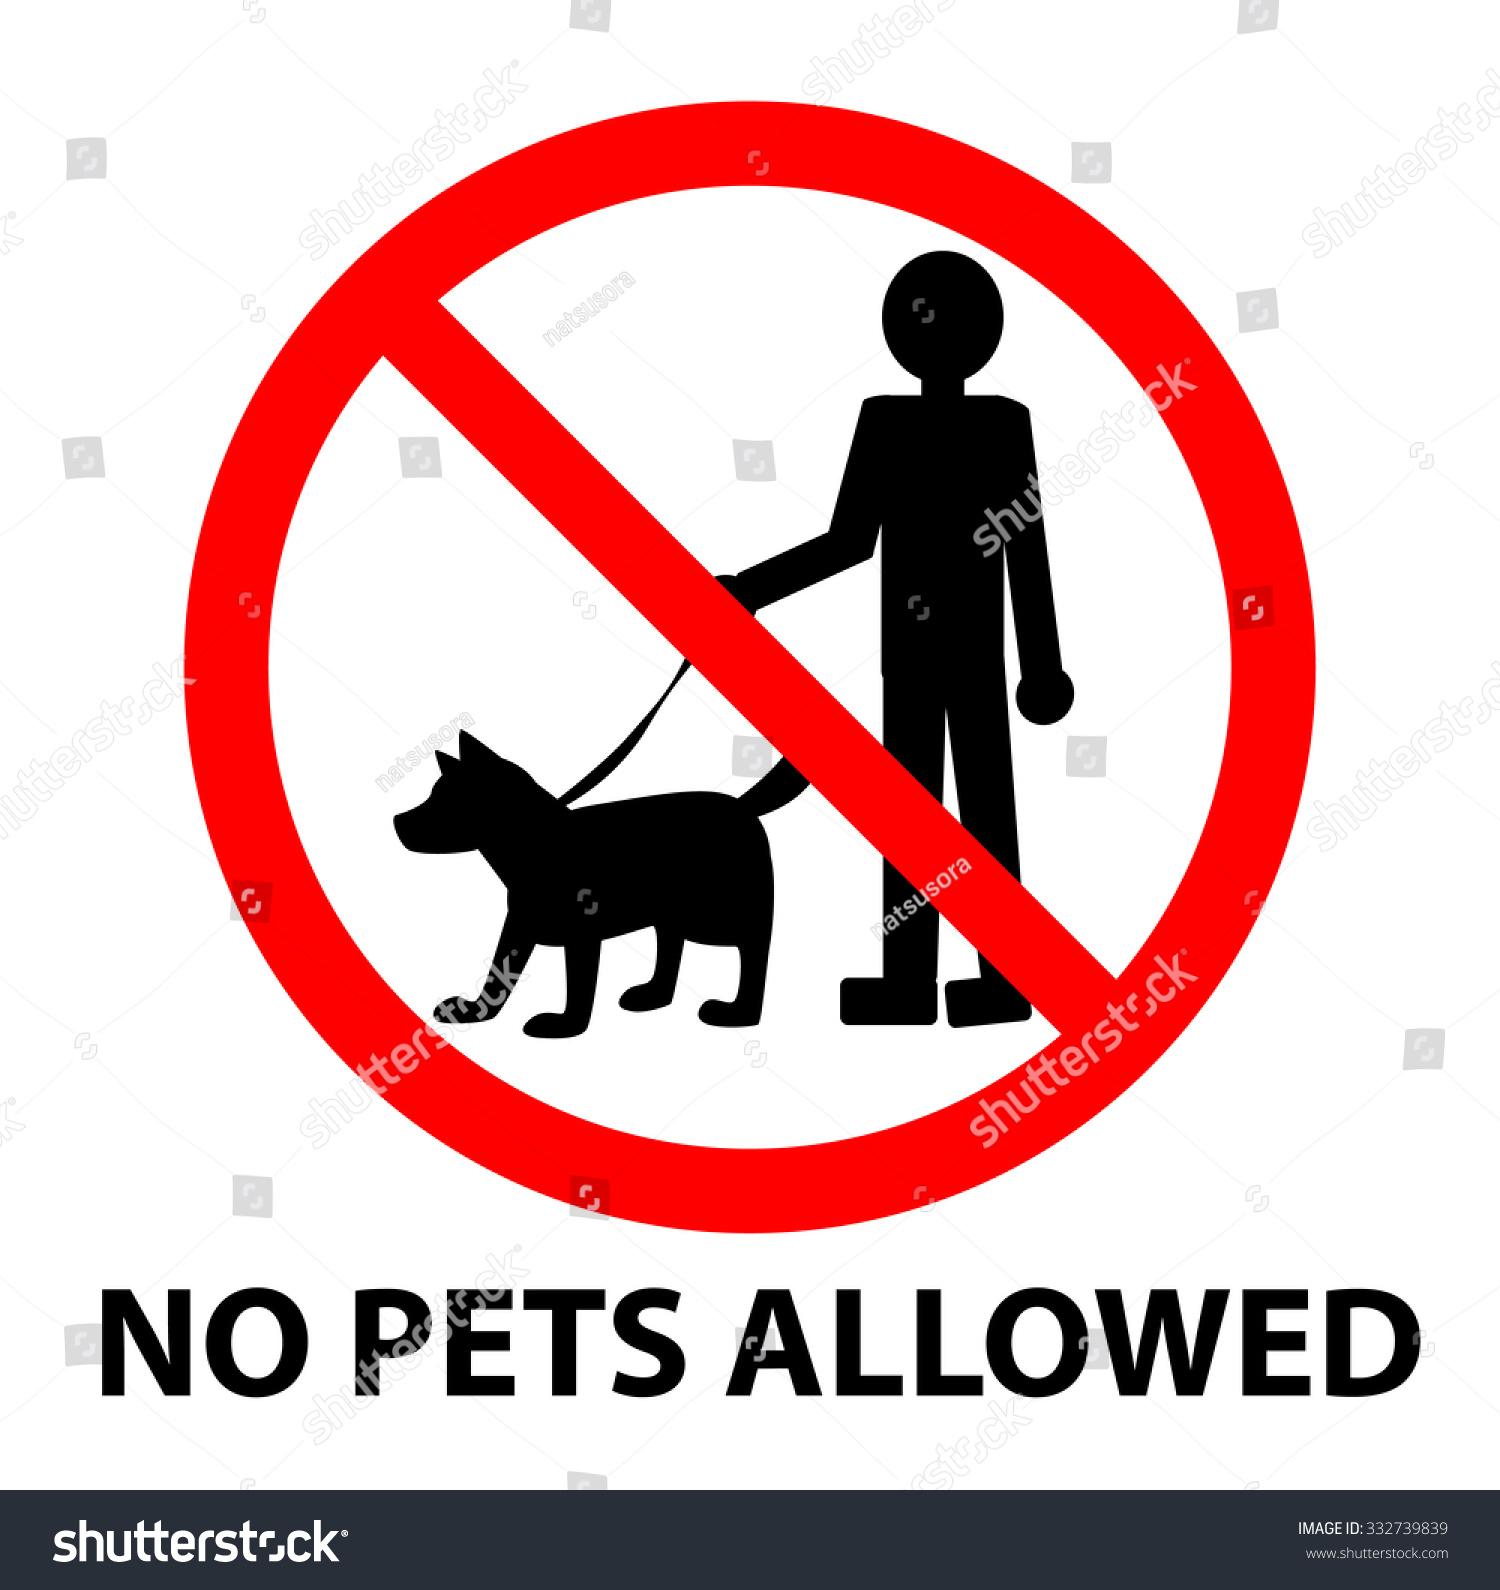 No Pets Allowed Sign Vector